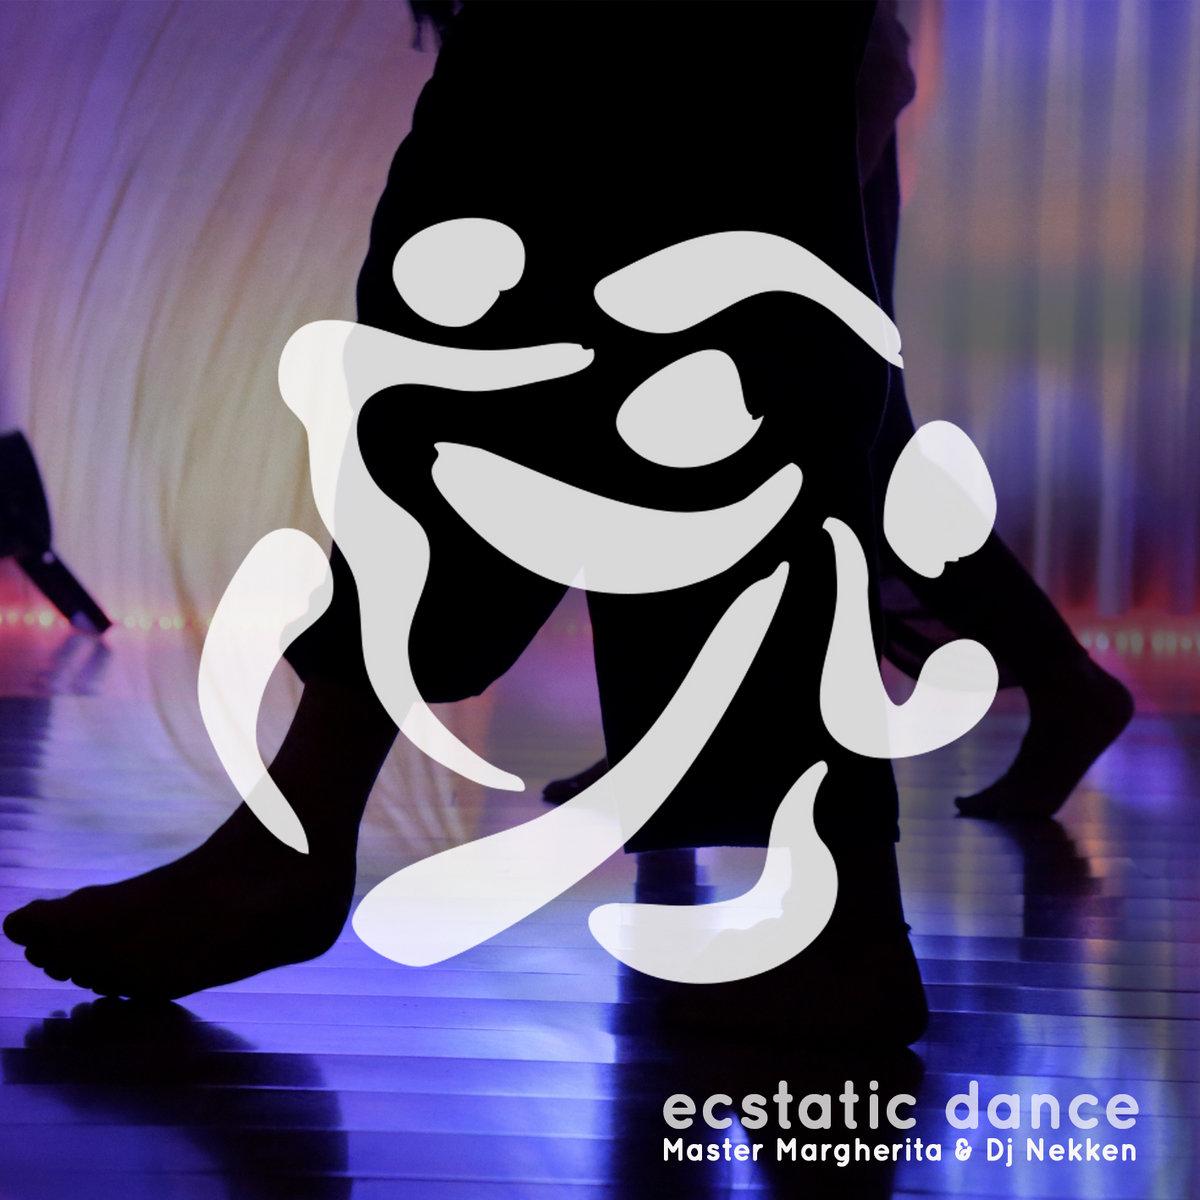 Ecstatic Dance | Master Margherita